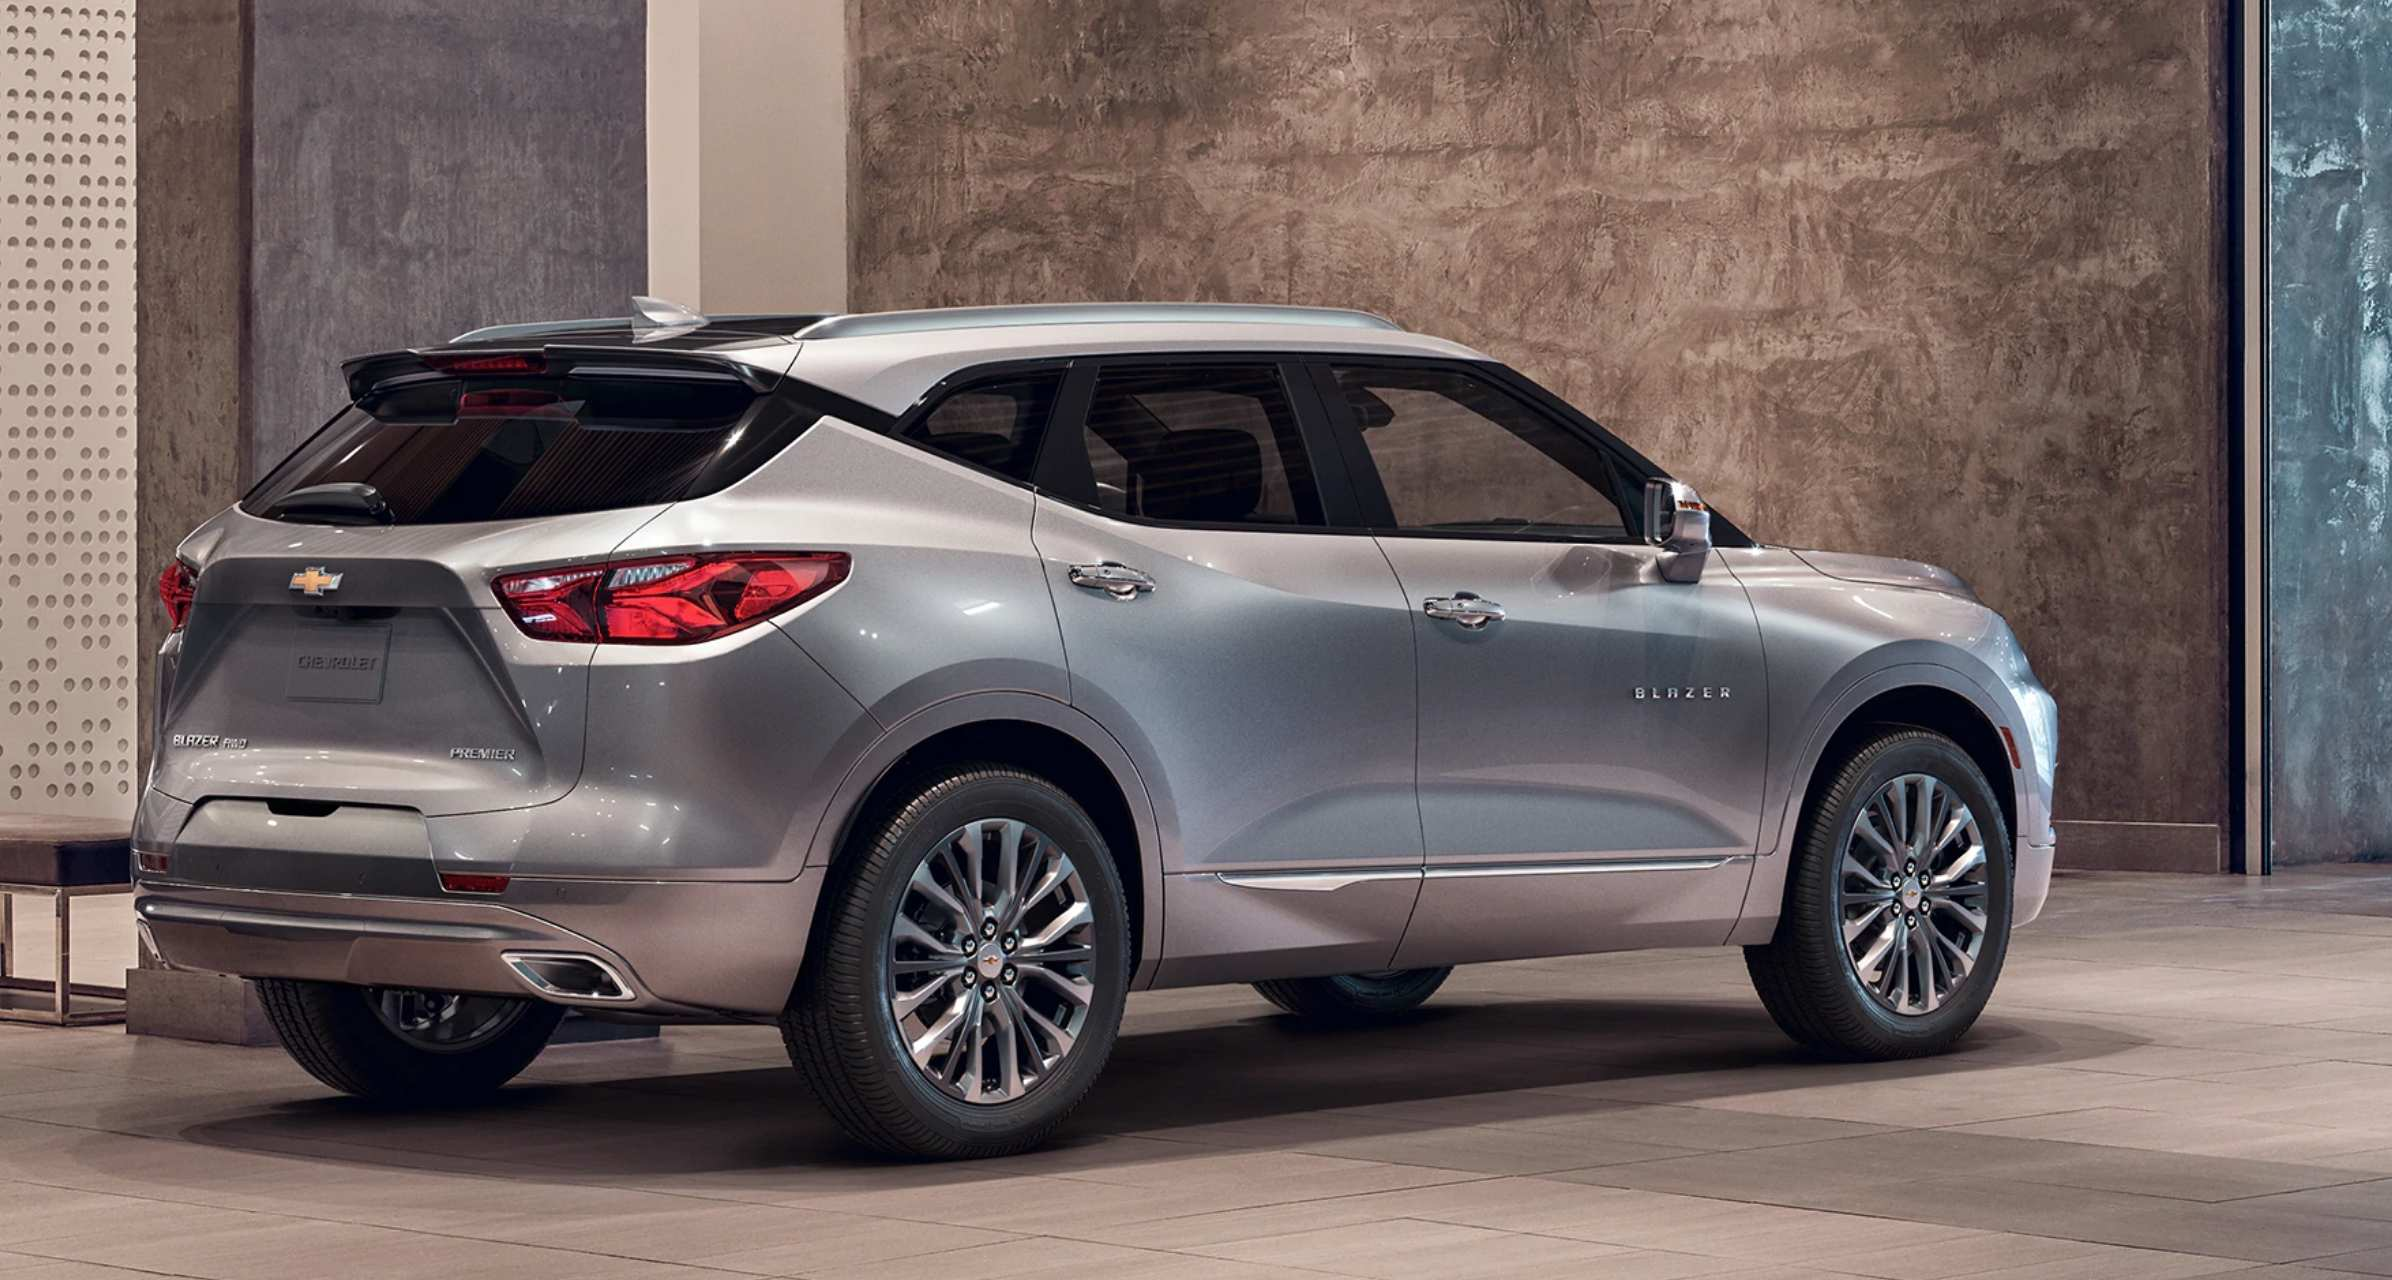 58 Concept of The Subaru 2019 Baja Review Release Date for The Subaru 2019 Baja Review